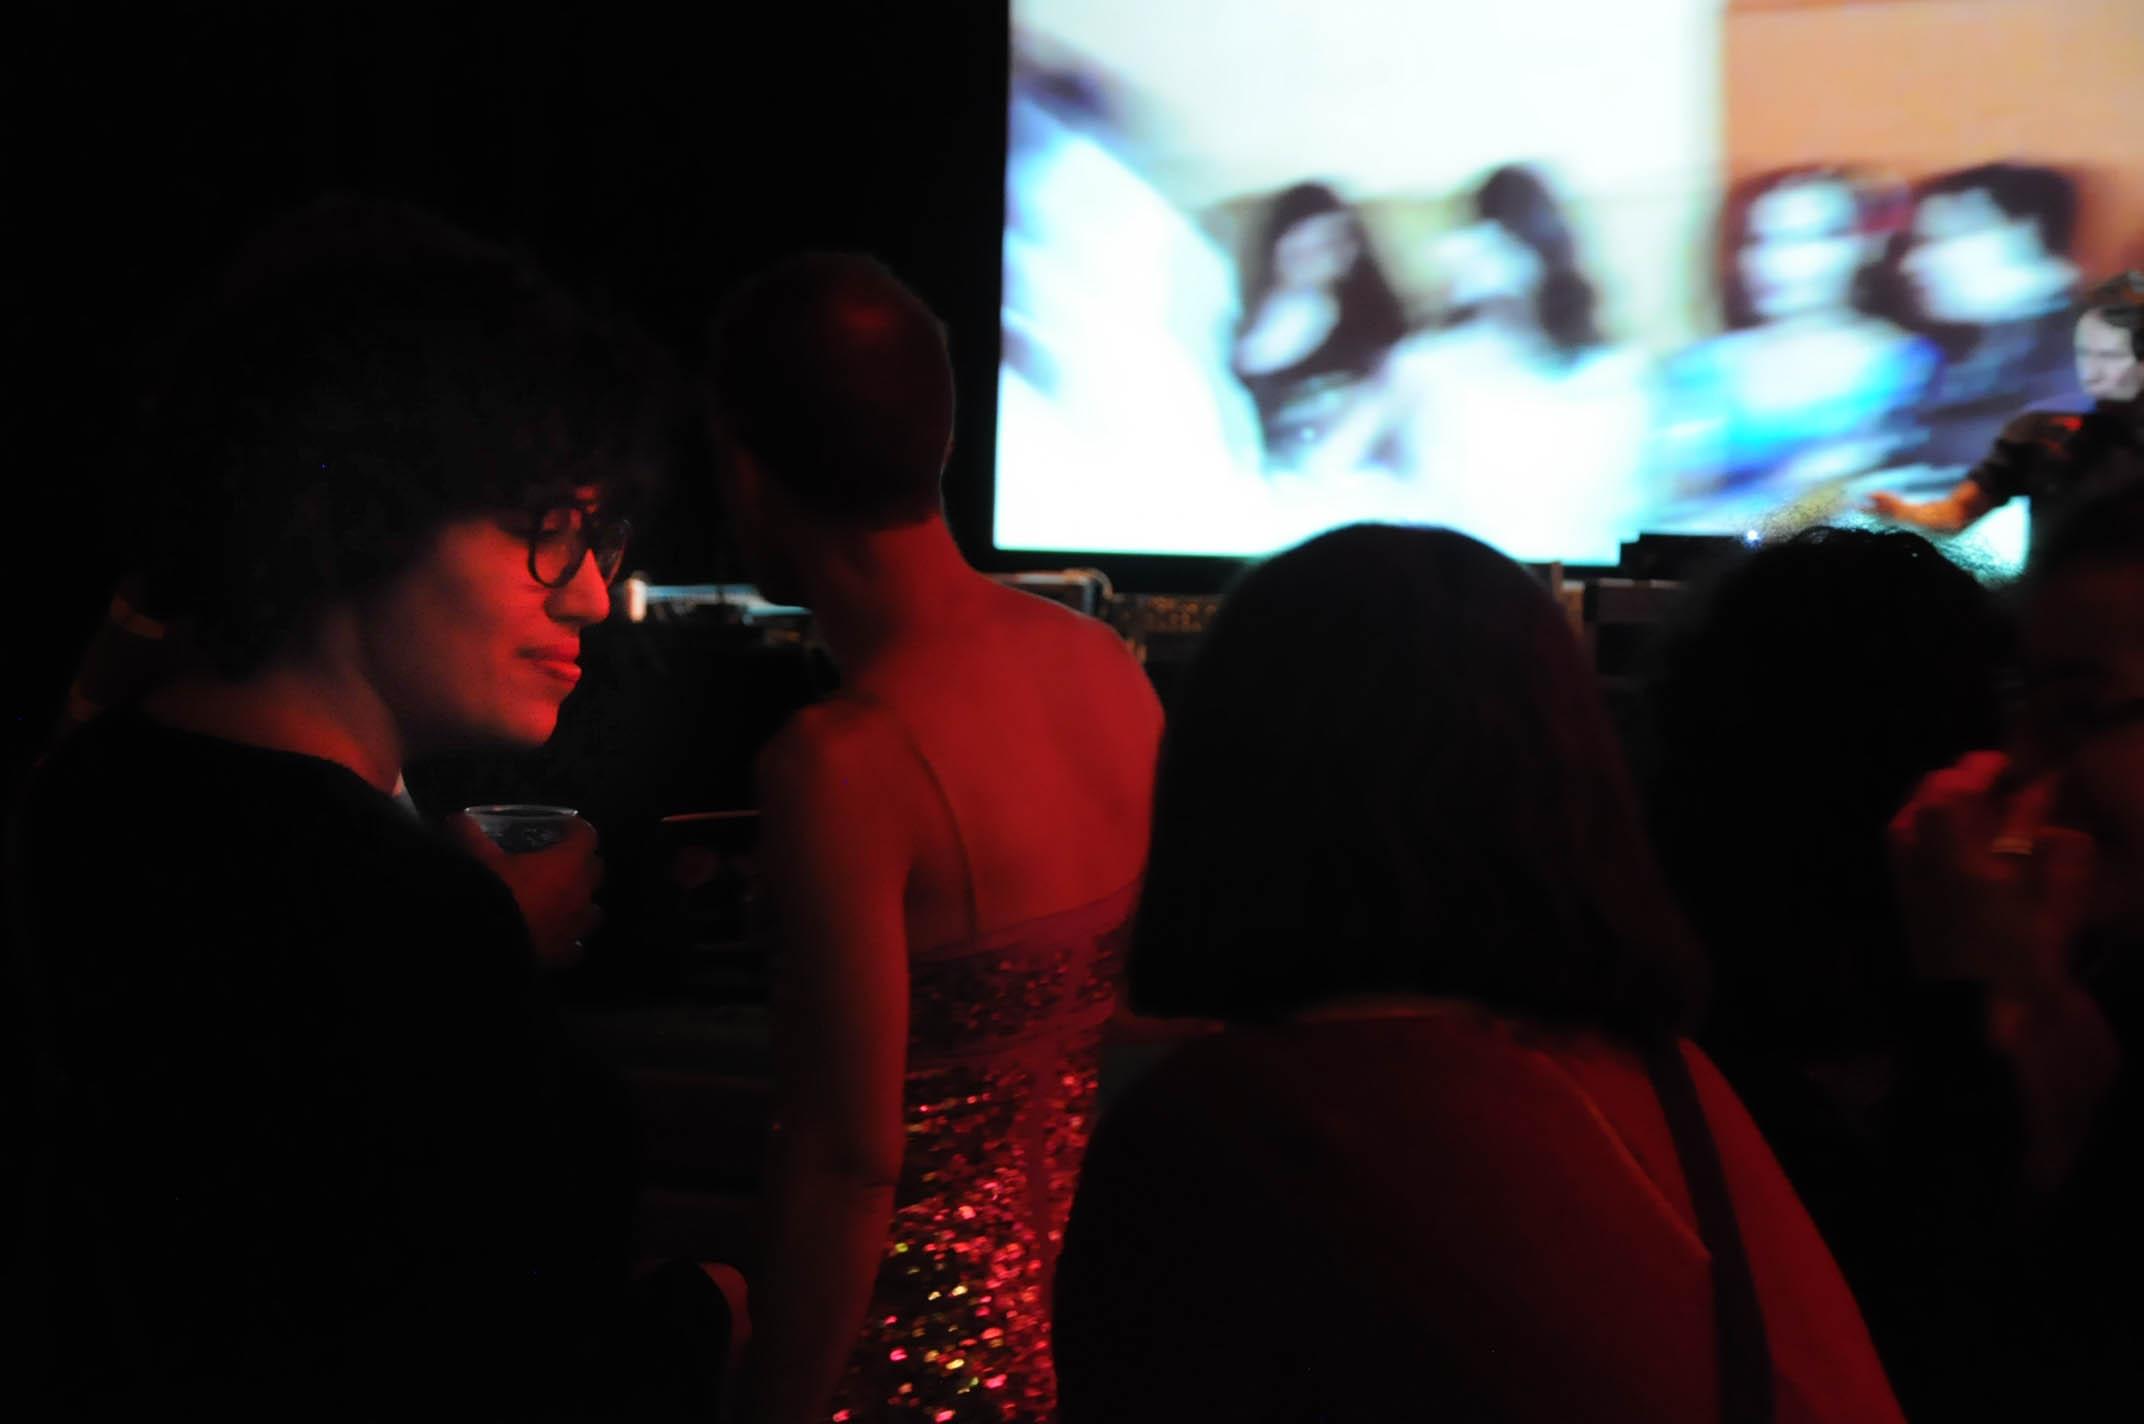 pink-screens-_0056-cesar-vromman